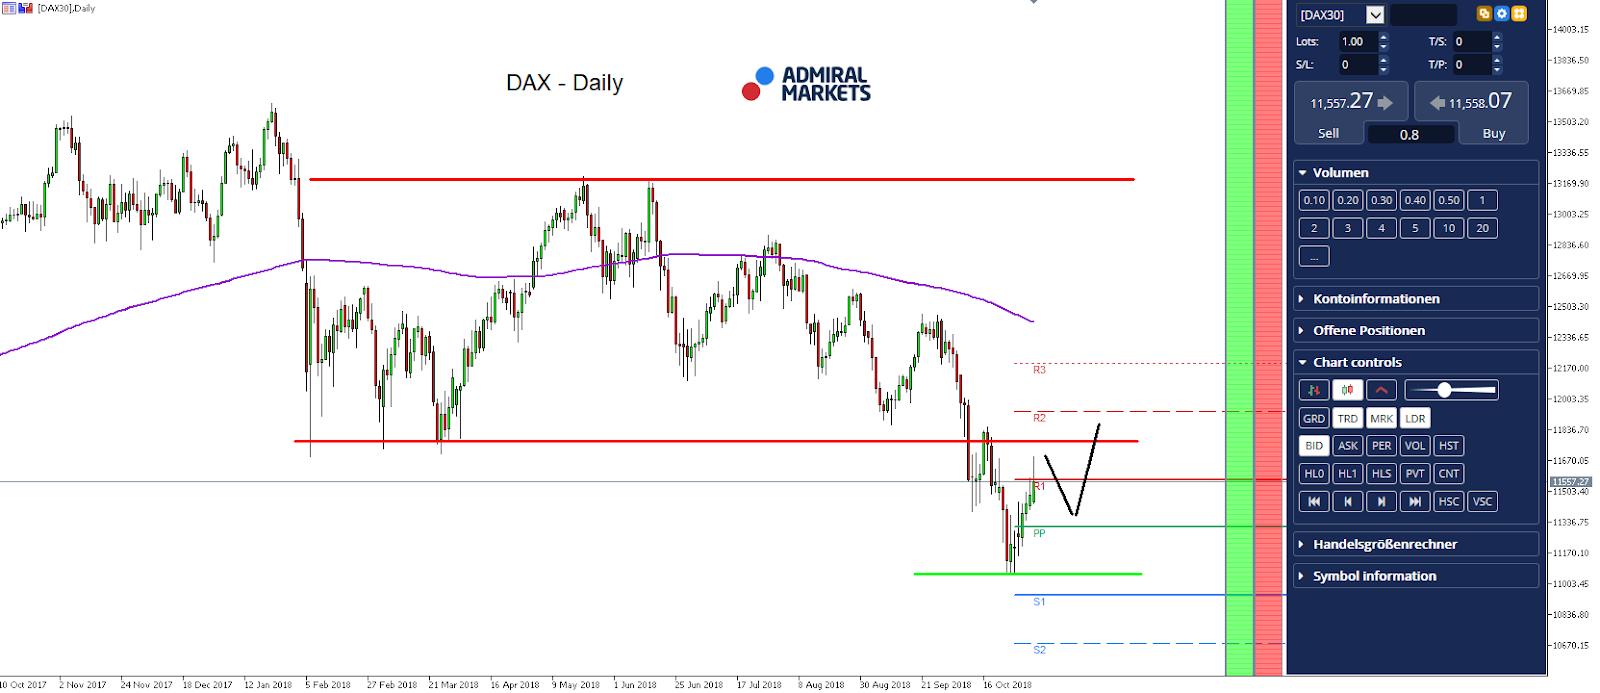 DAX30 Daily Chart